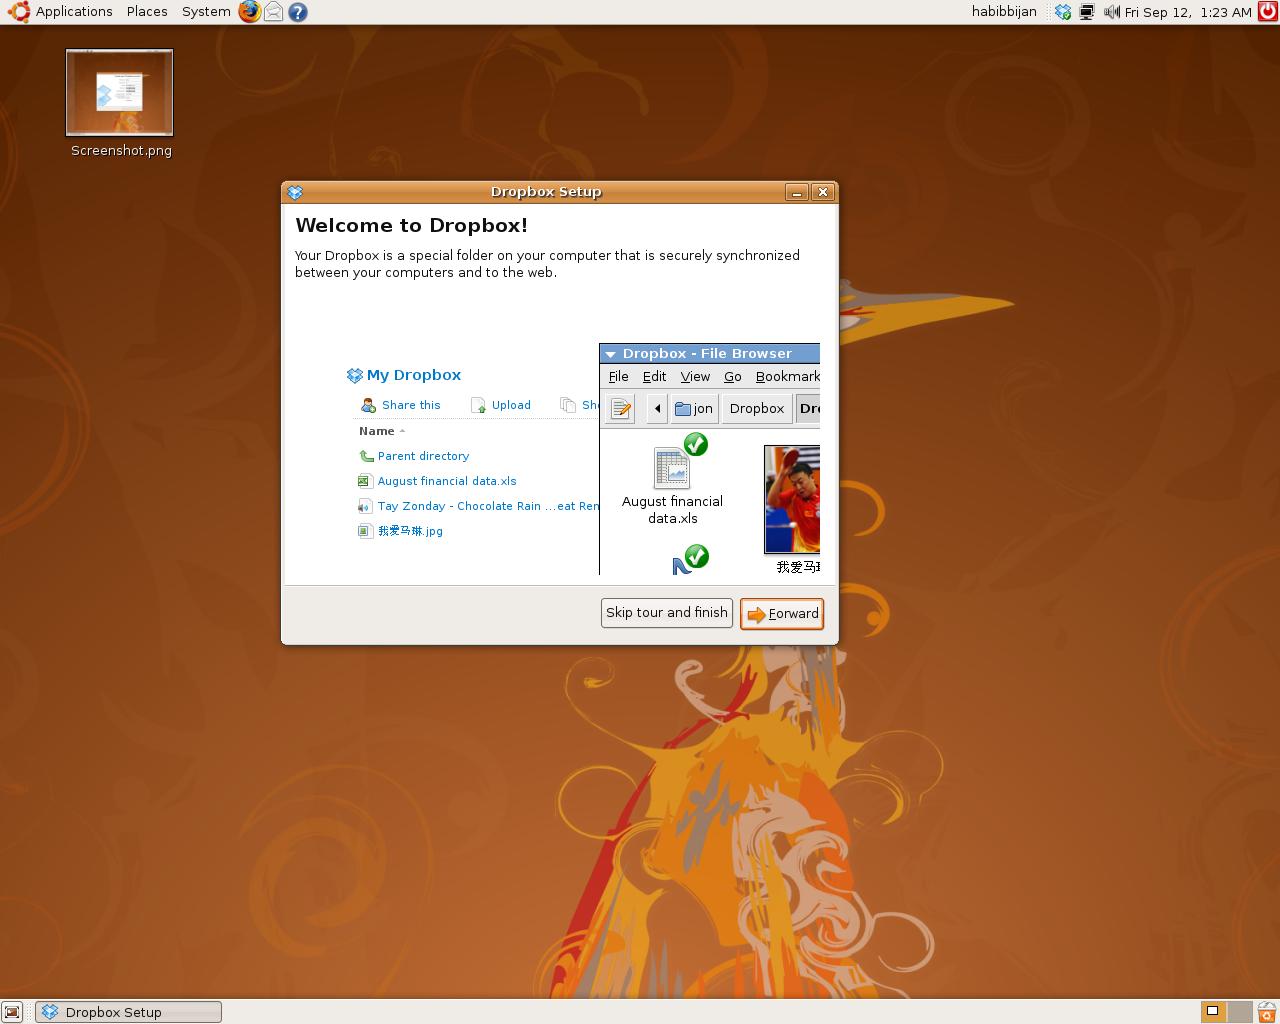 Install Dropbox Ubuntu 20.04